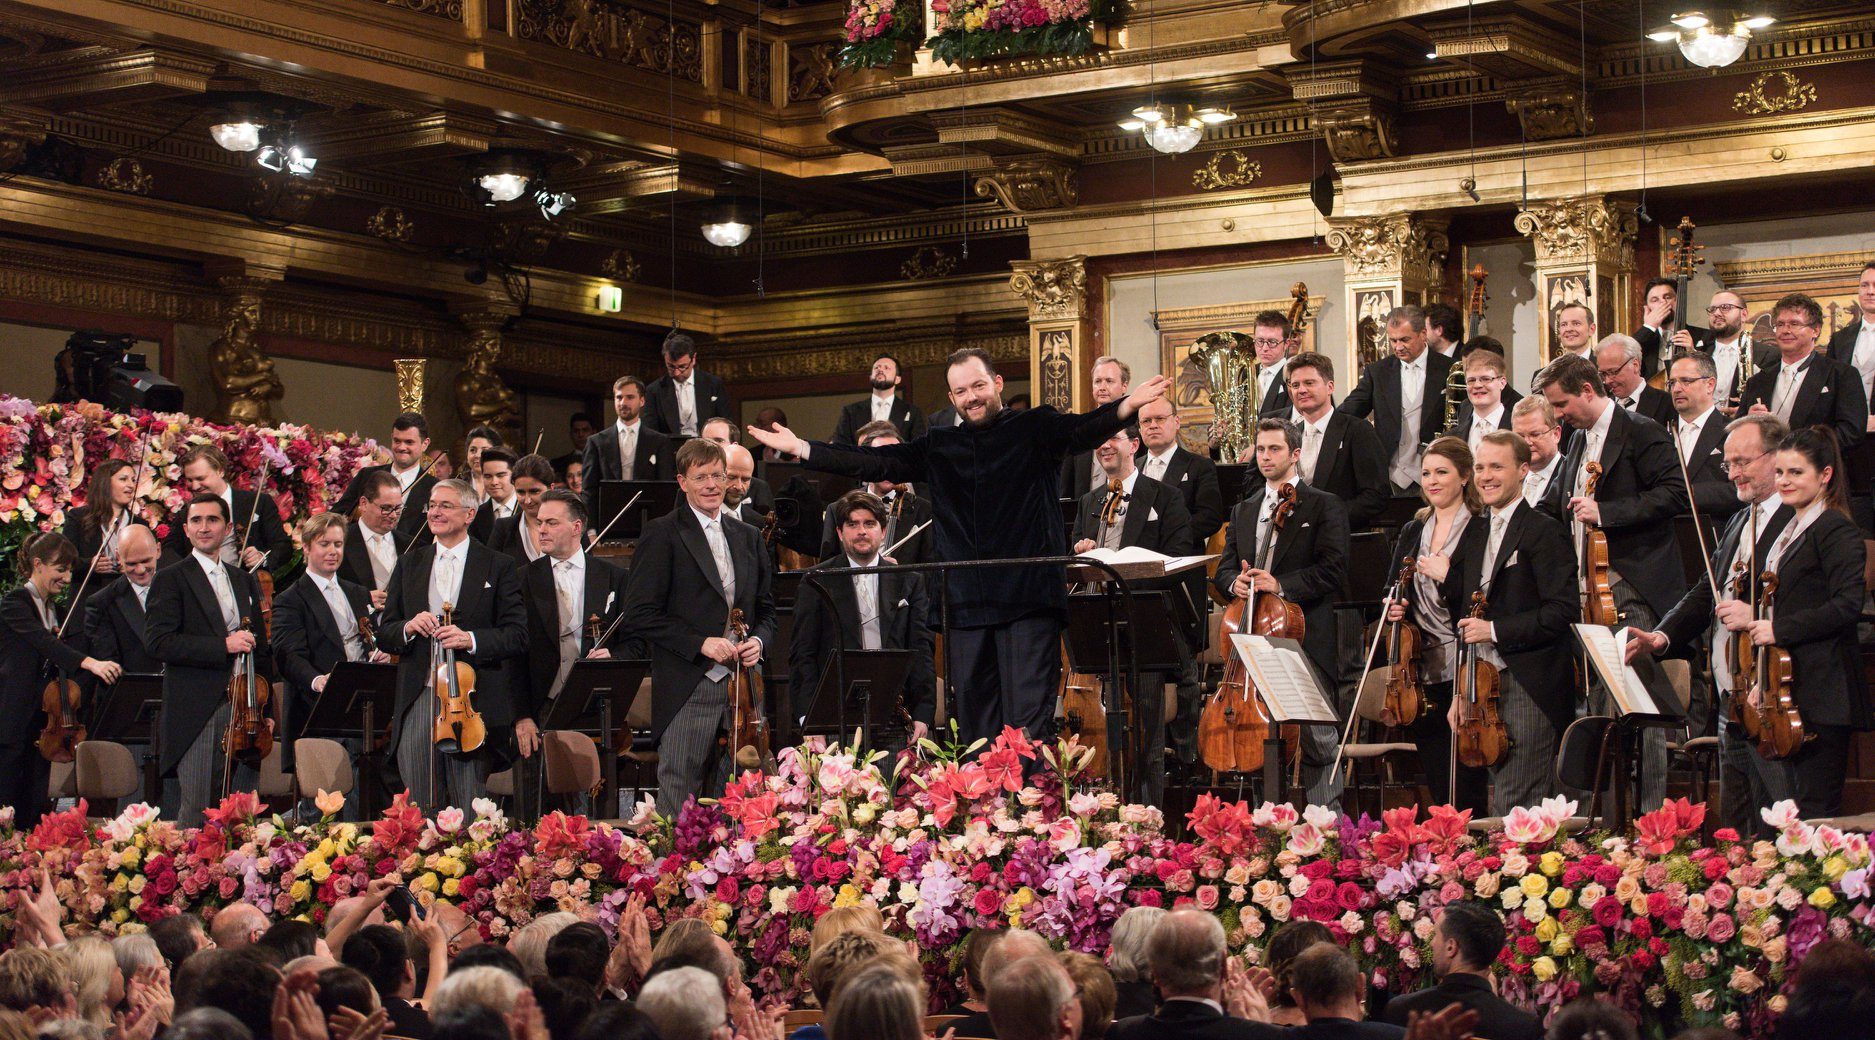 The money behind Vienna's New Year's Day concert